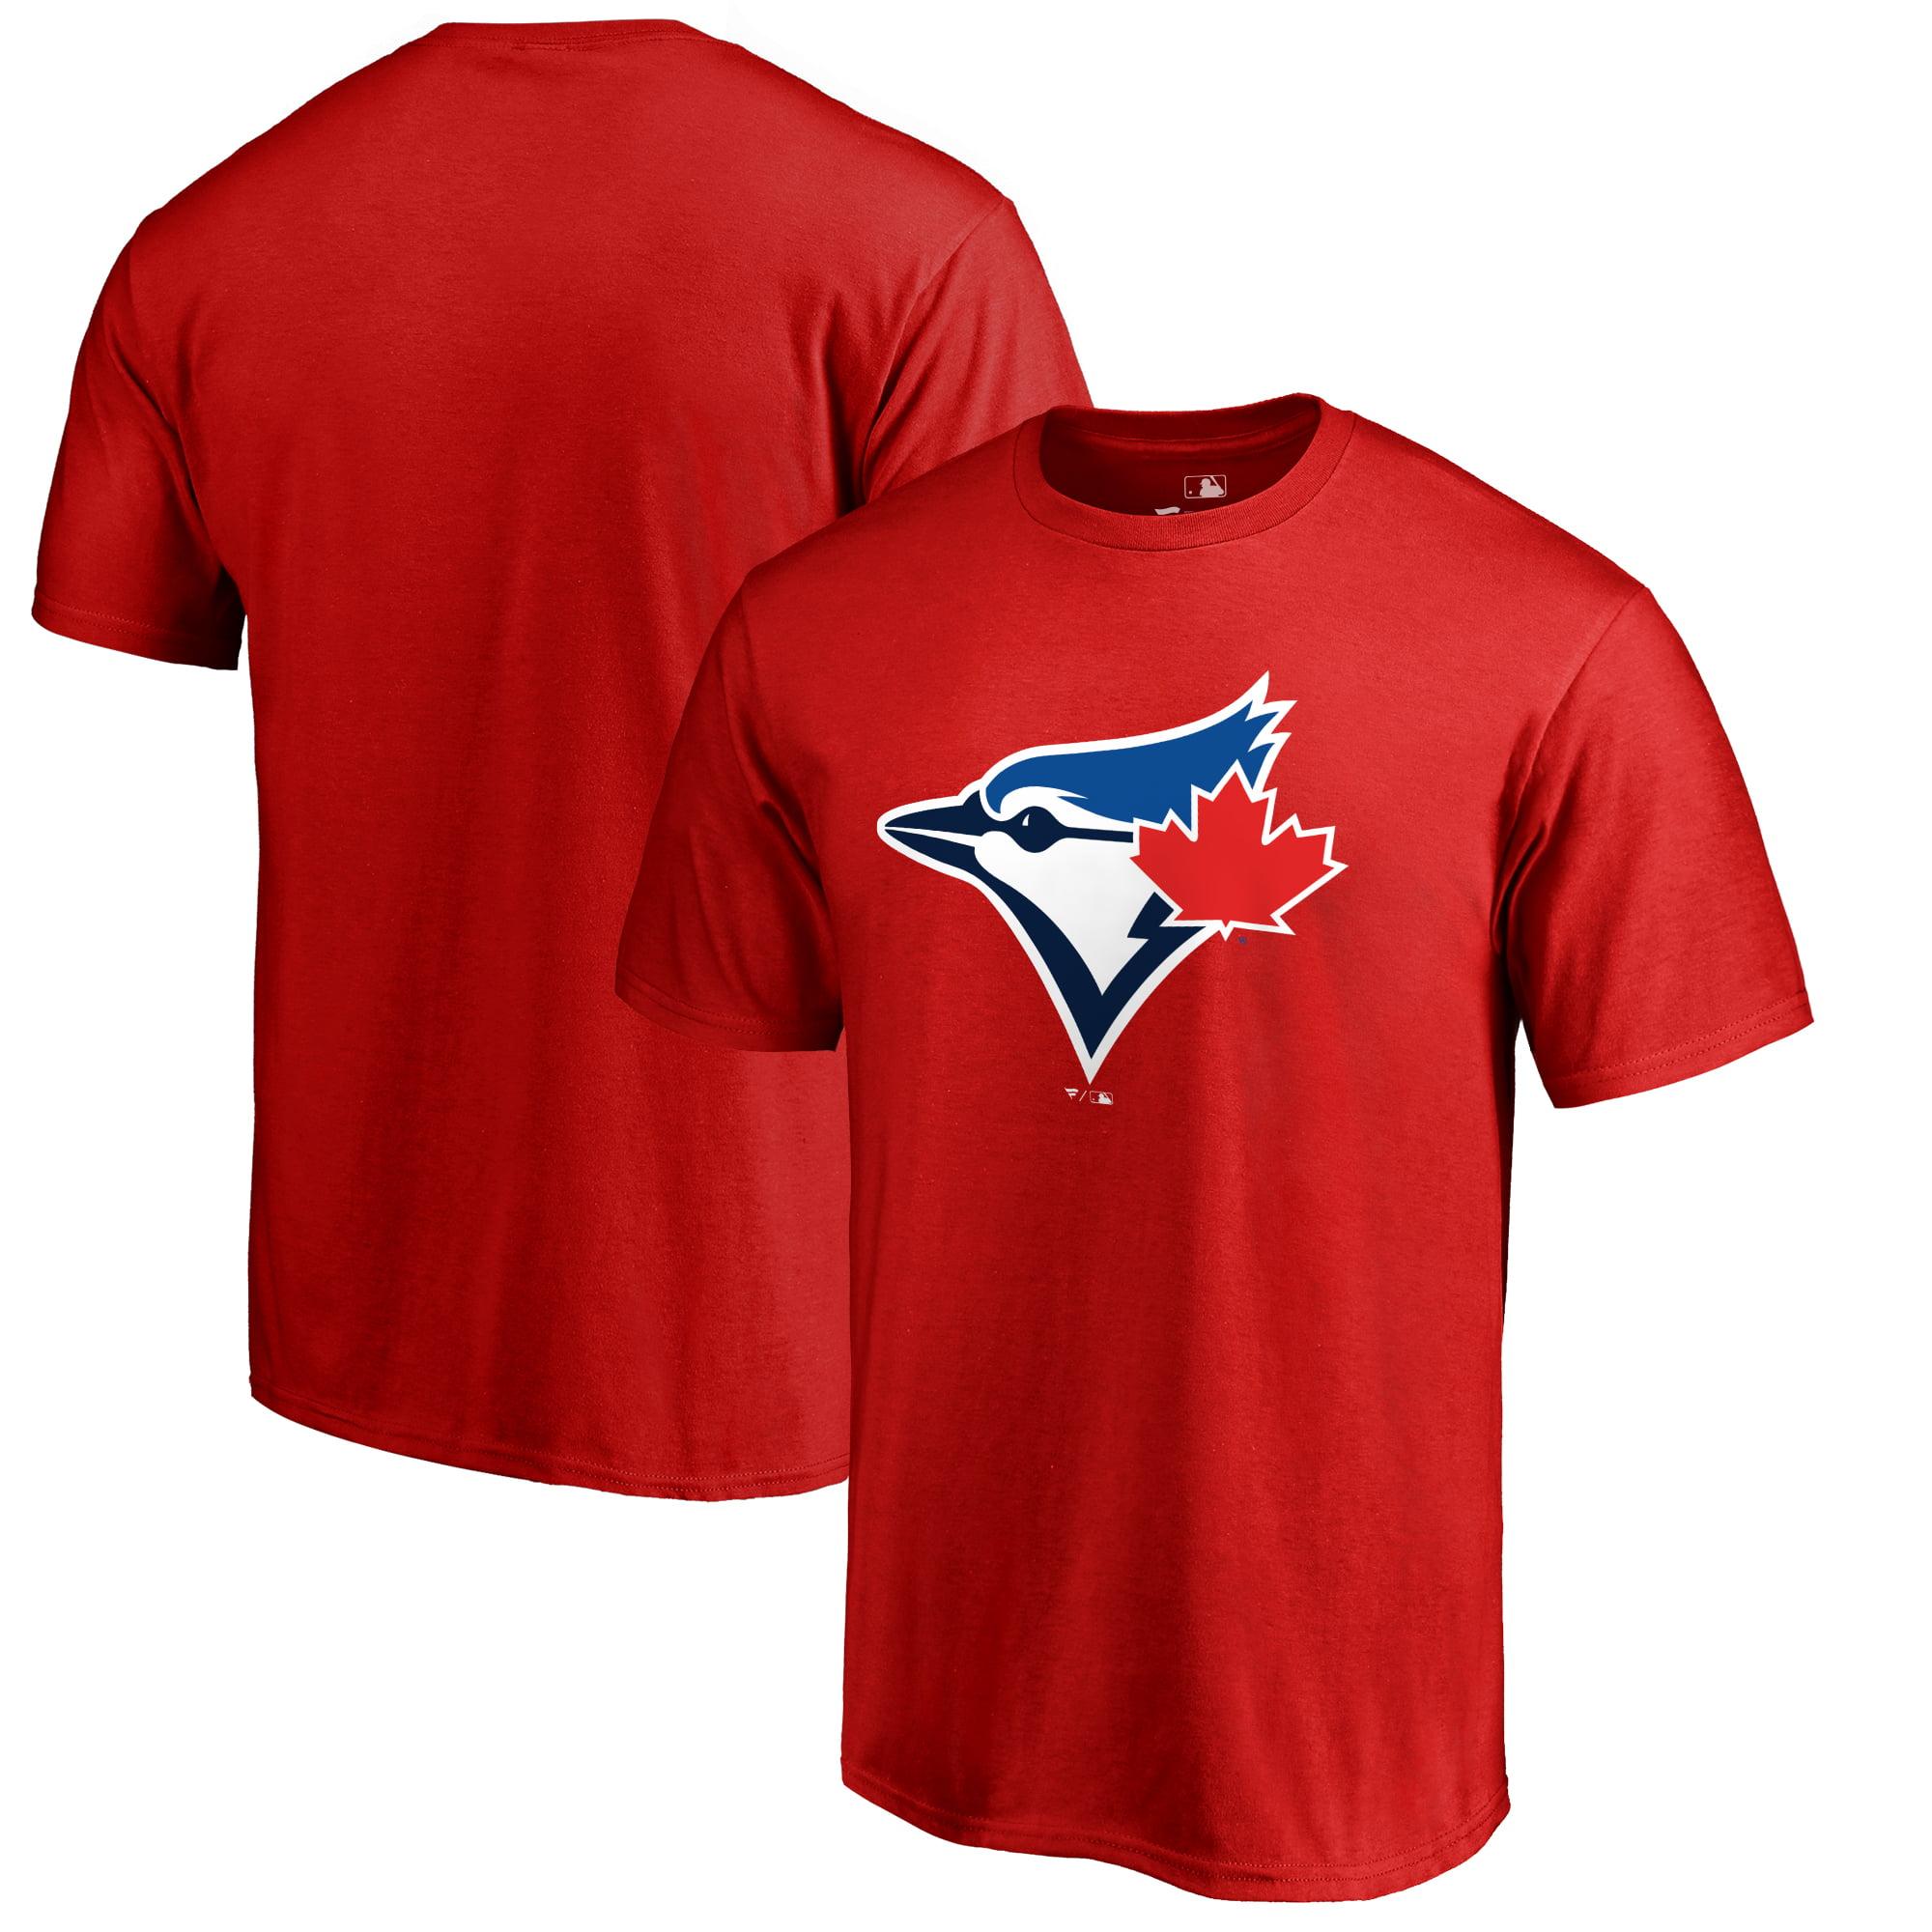 Toronto Blue Jays Fanatics Branded Big & Tall Logo T-Shirt - Red